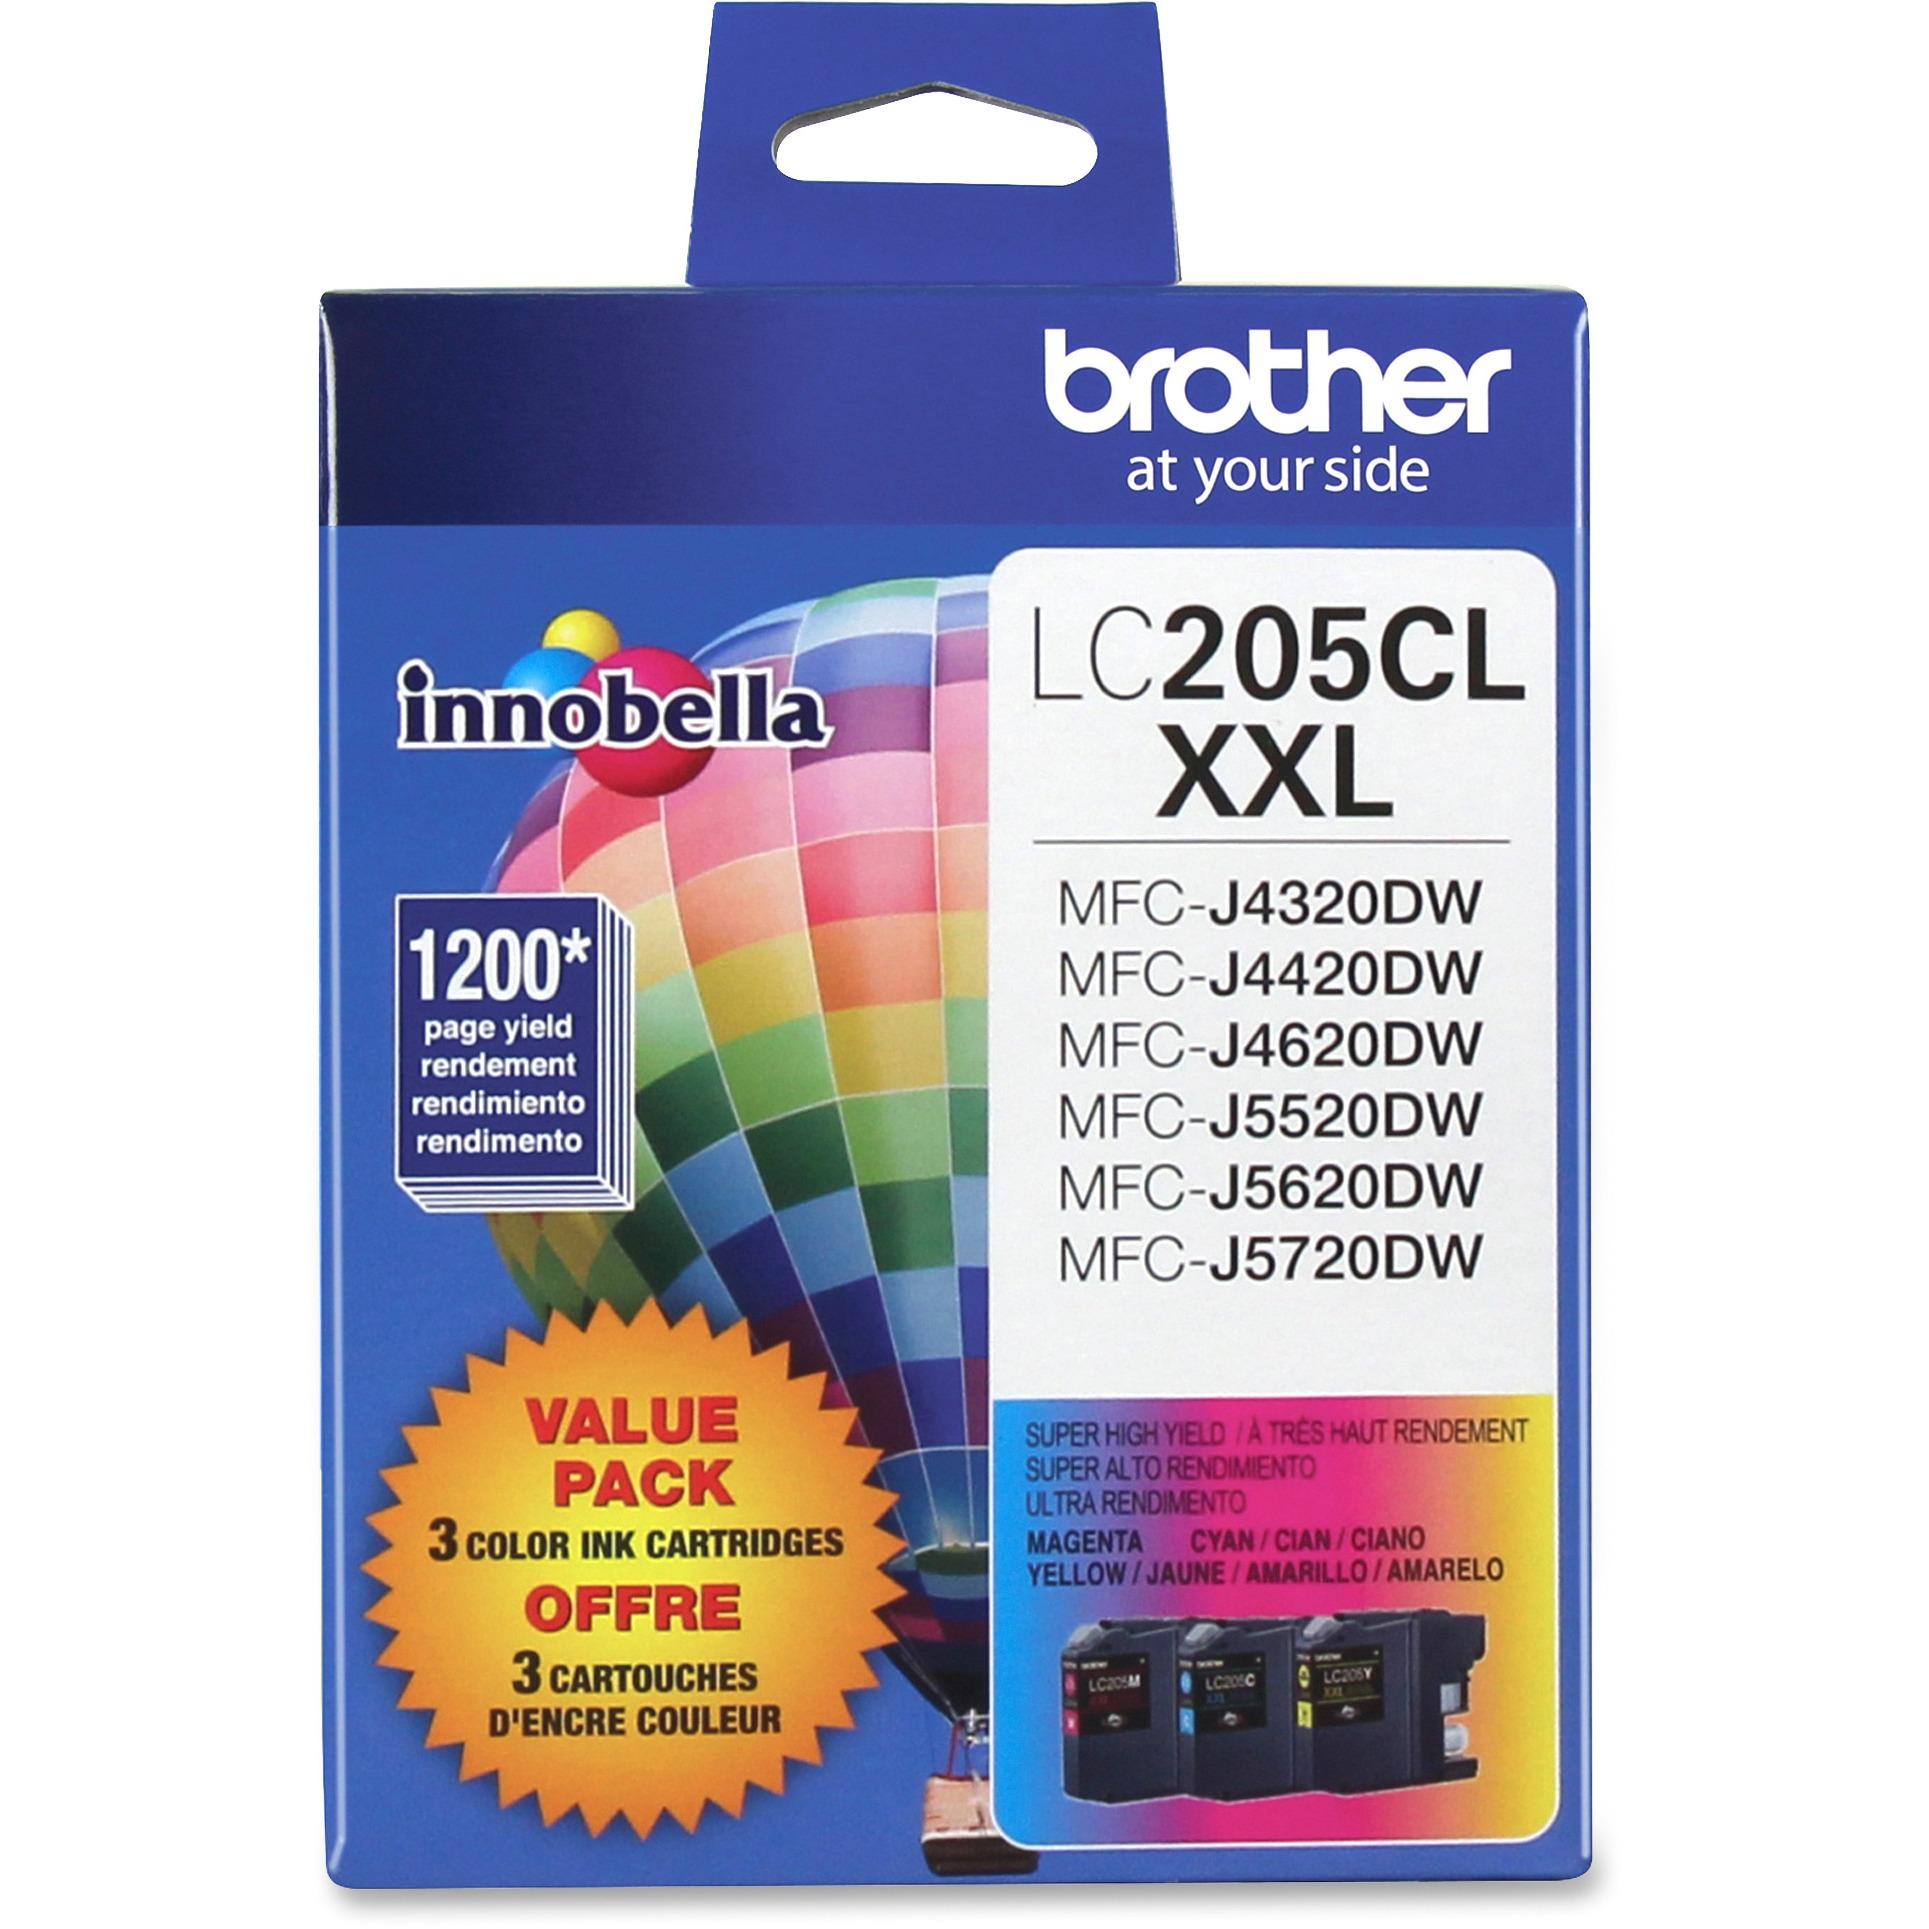 Brother LC2053PKS Innobella Super High-Yield Ink, Cyan/Magenta/Yellow, 3/PK